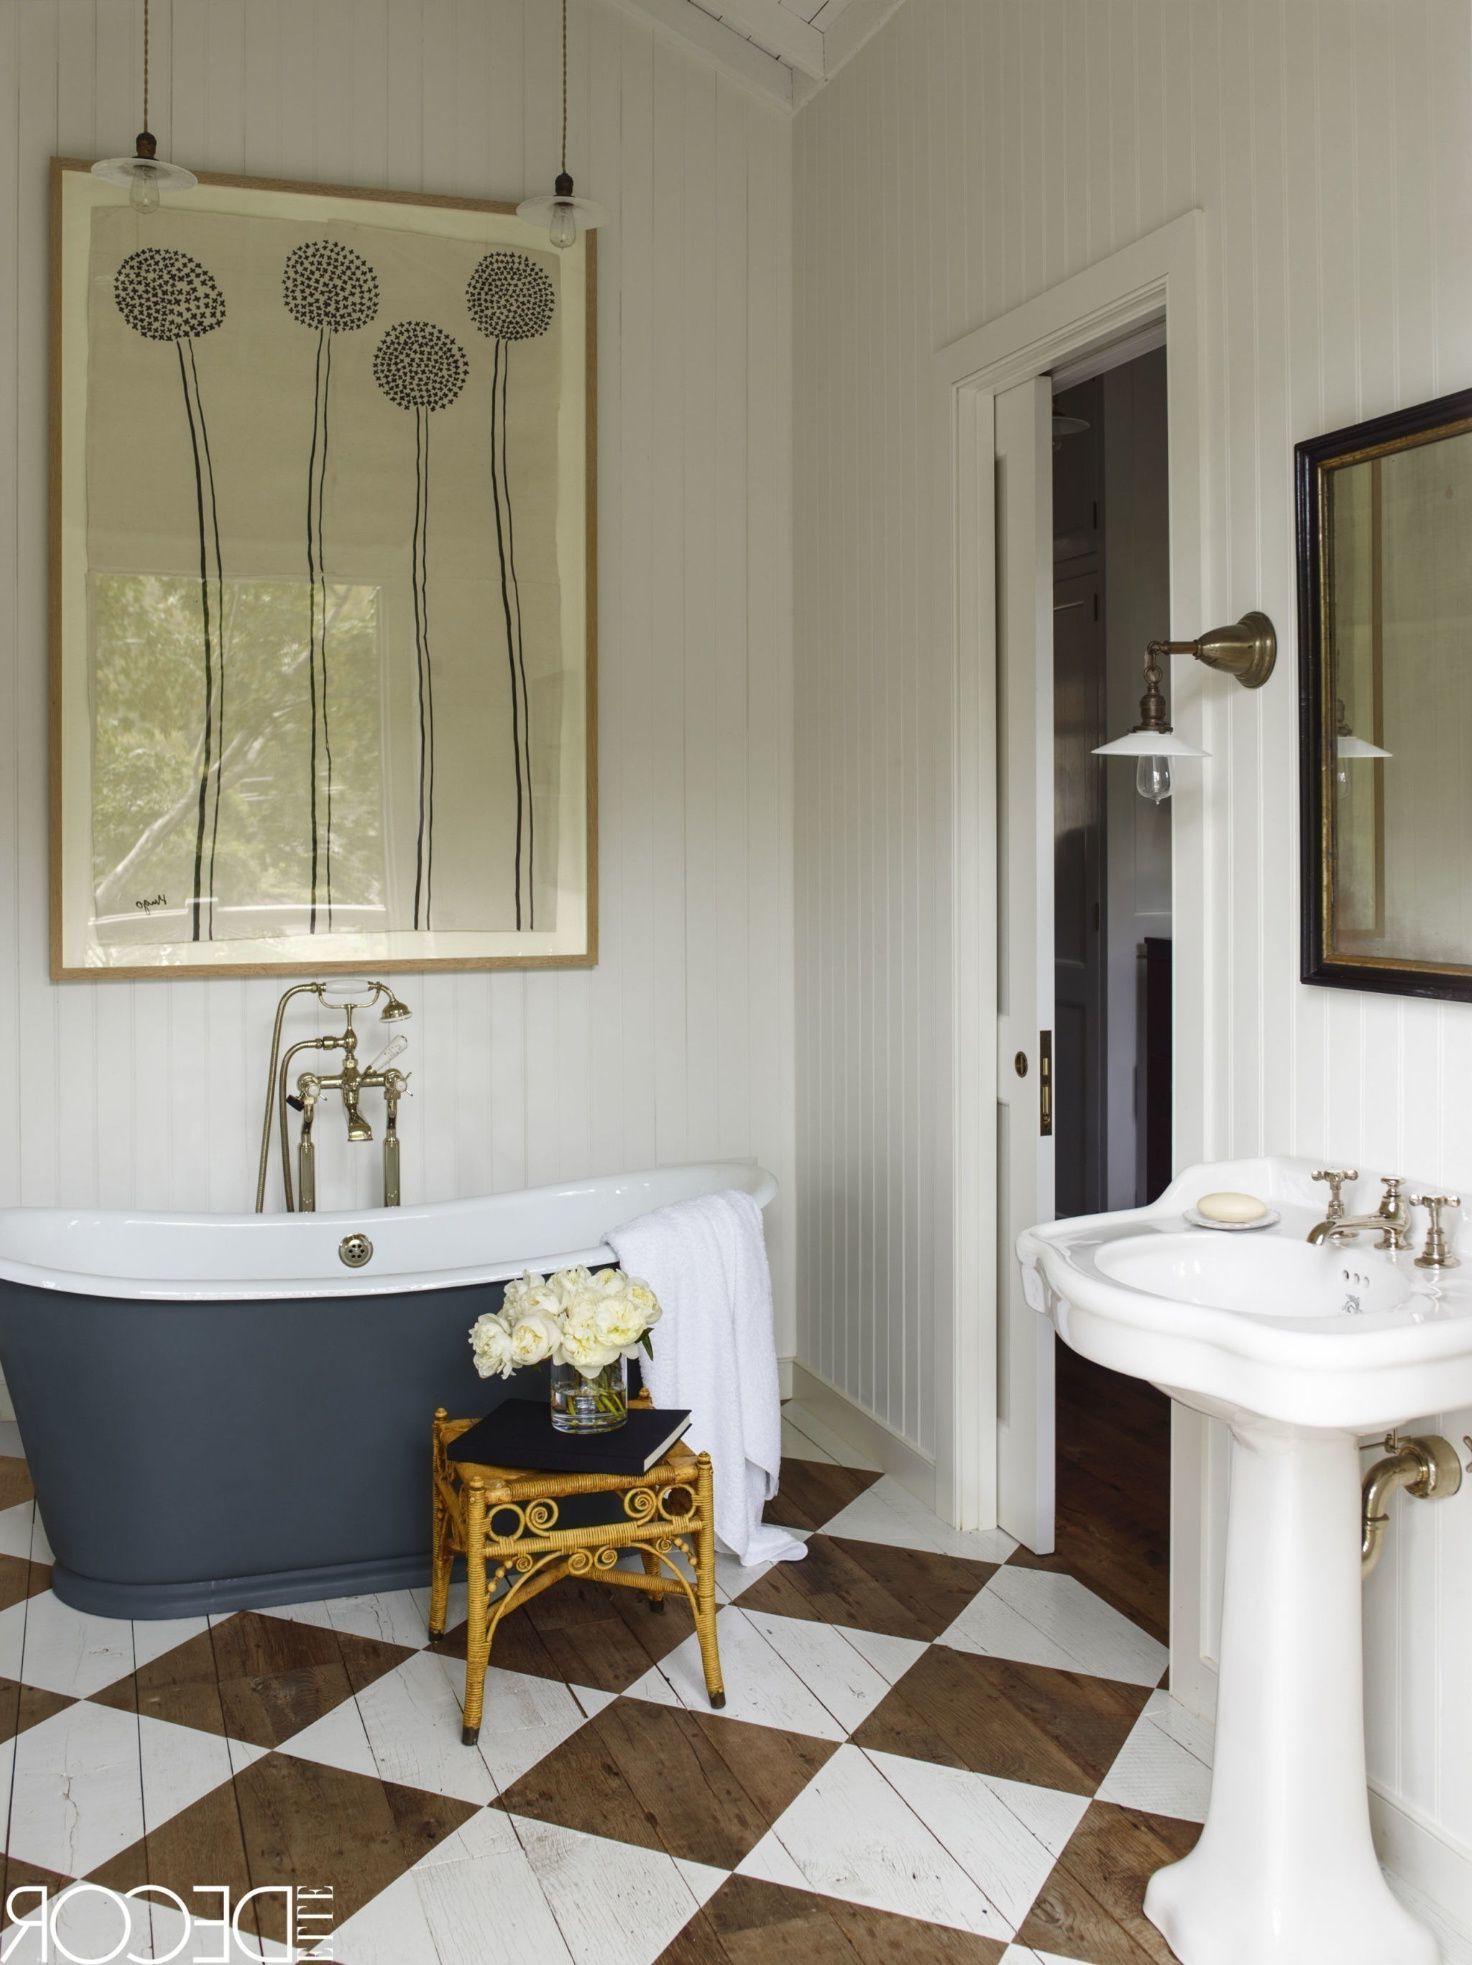 35 Bathroom Ideas For Small Bathrooms To Make Look Bigger With Images Bathroom Shower Design Bathroom Remodel Cost Bathrooms Remodel